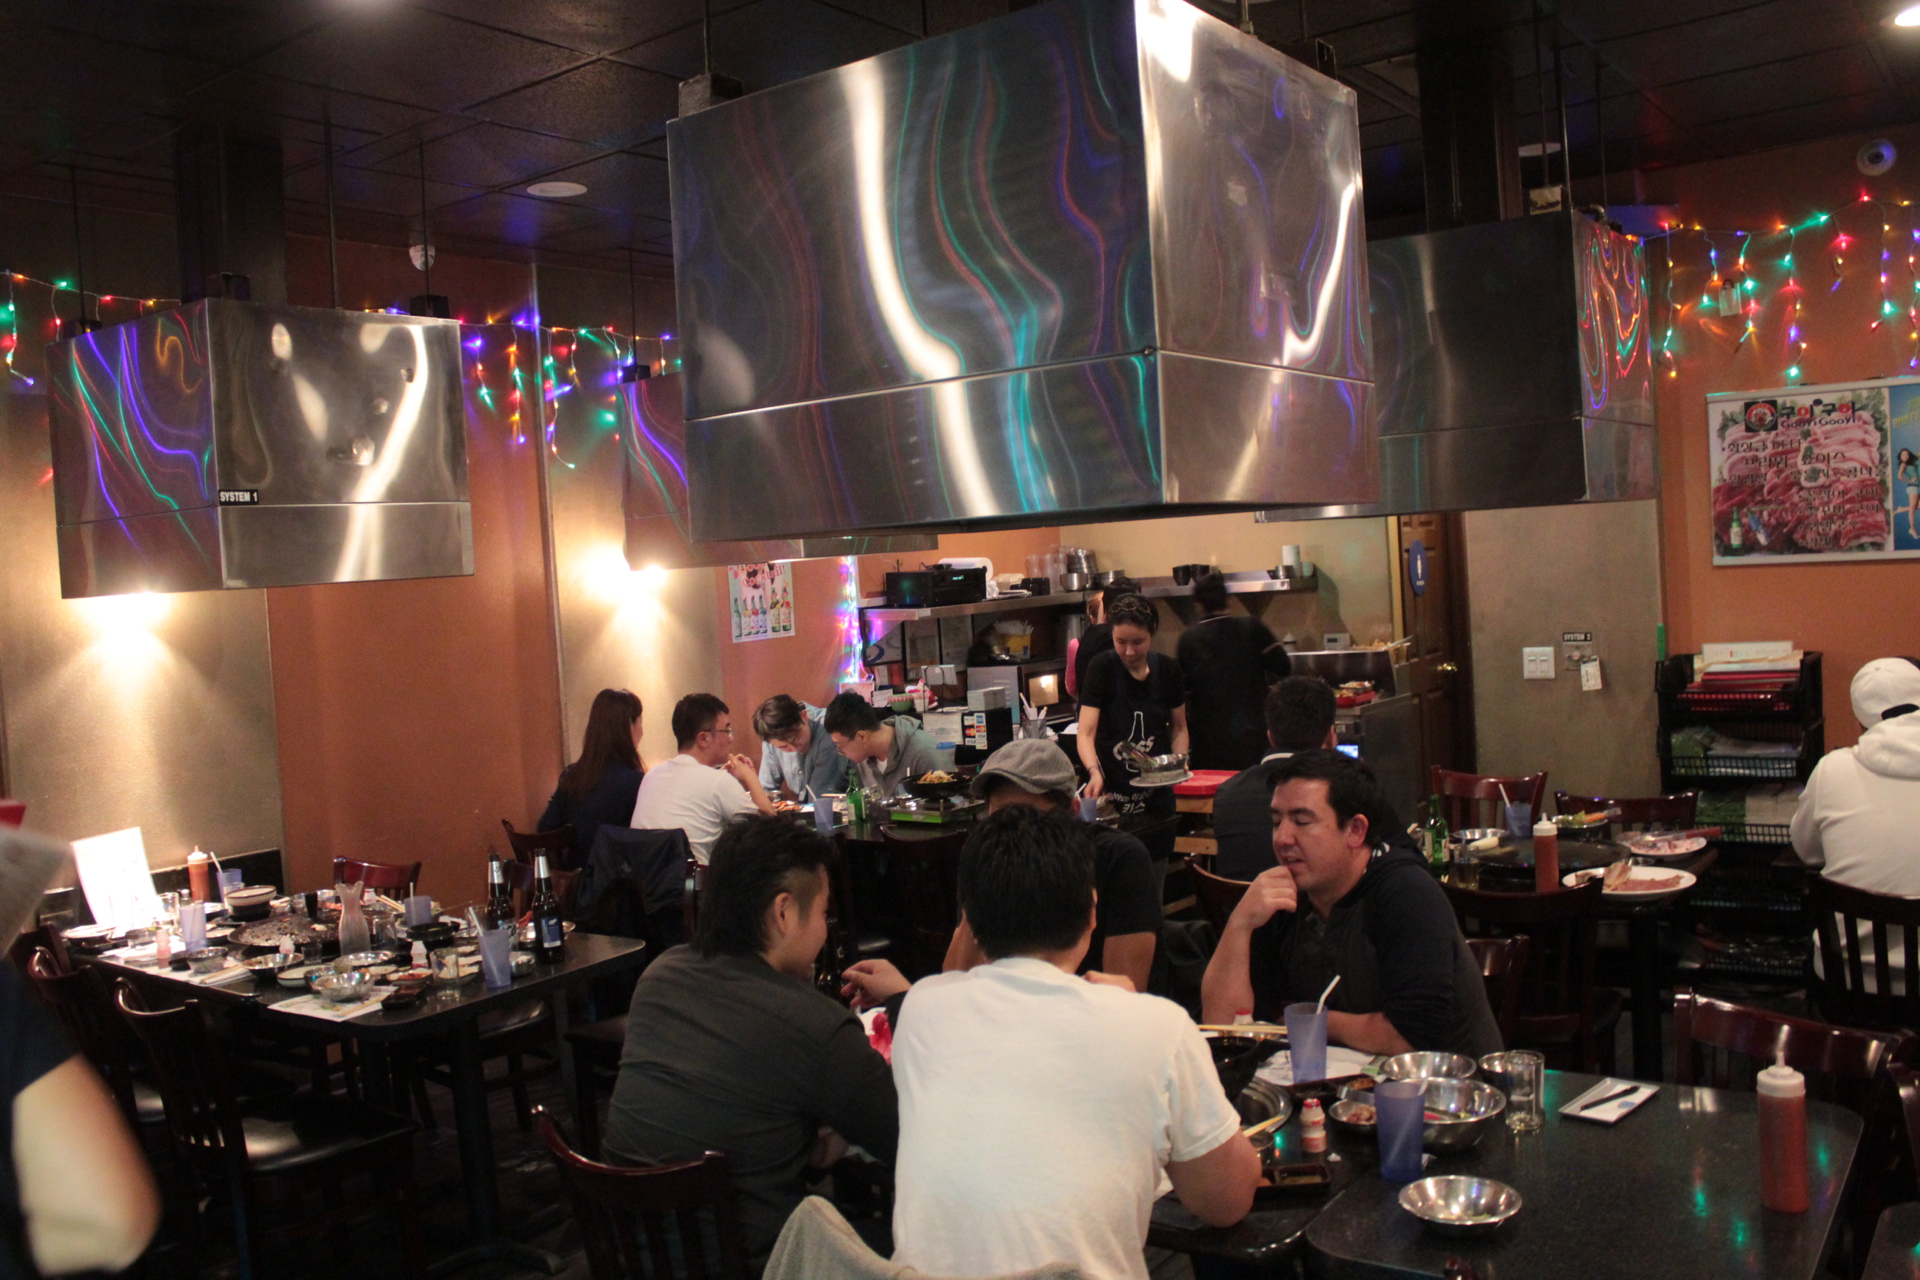 Diners inside Gooyi Gooyi in Santa Clara.